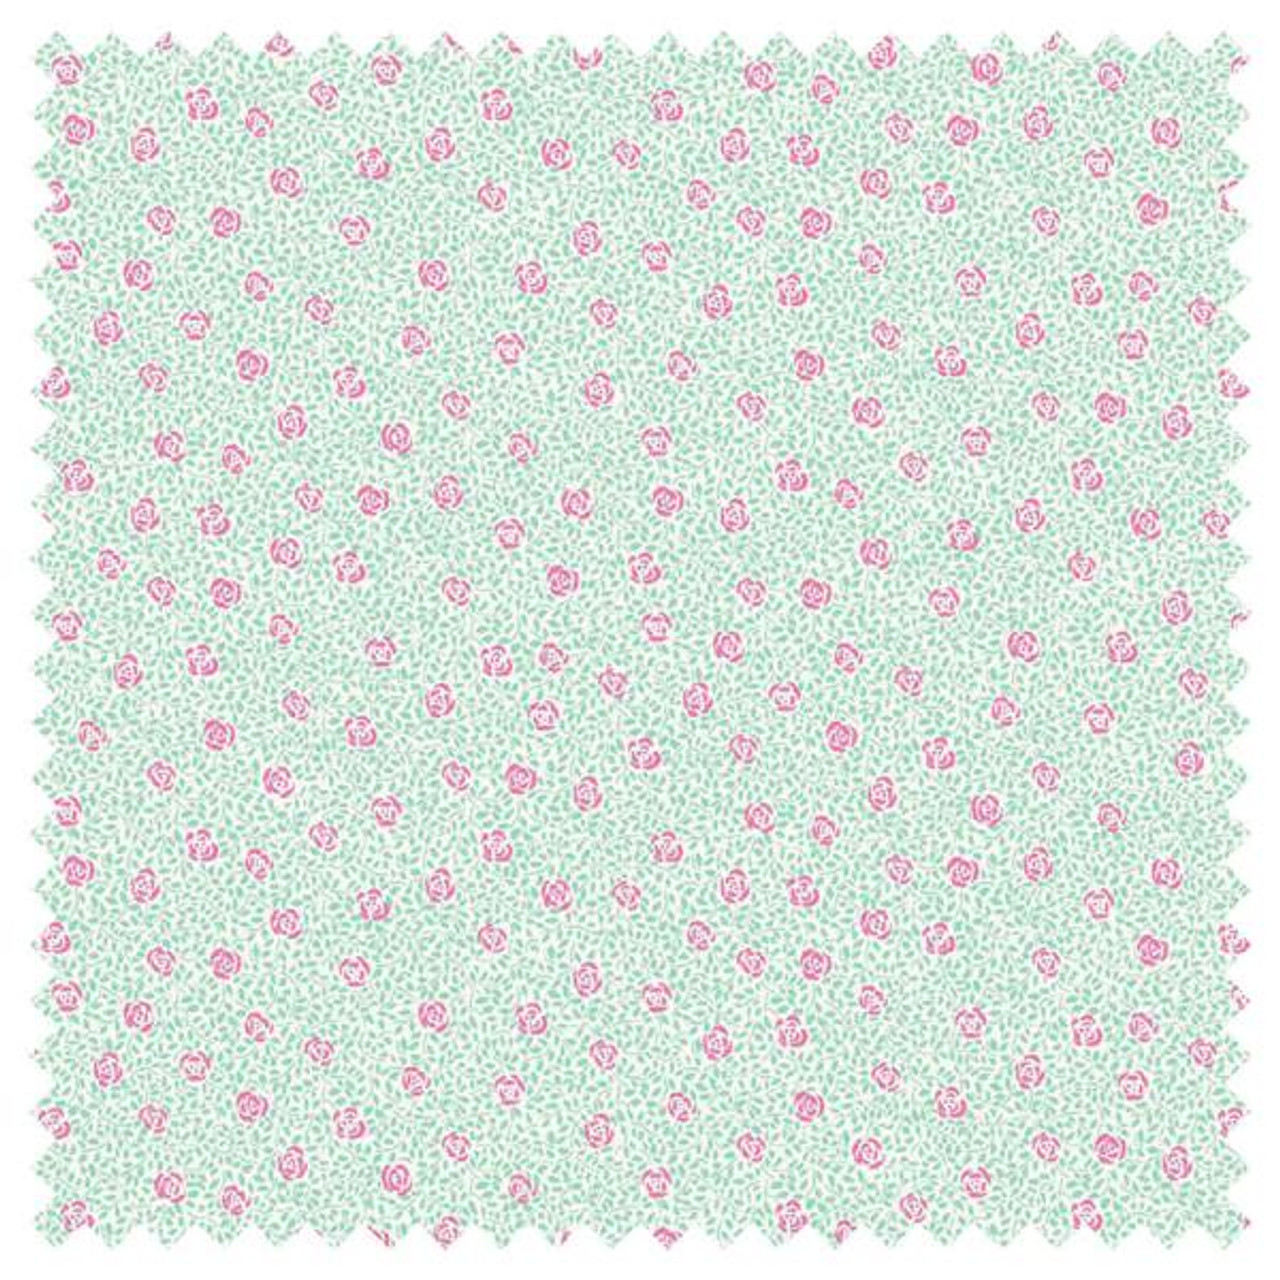 Liberty Cotton : Deco Dance, Speckled Rose A